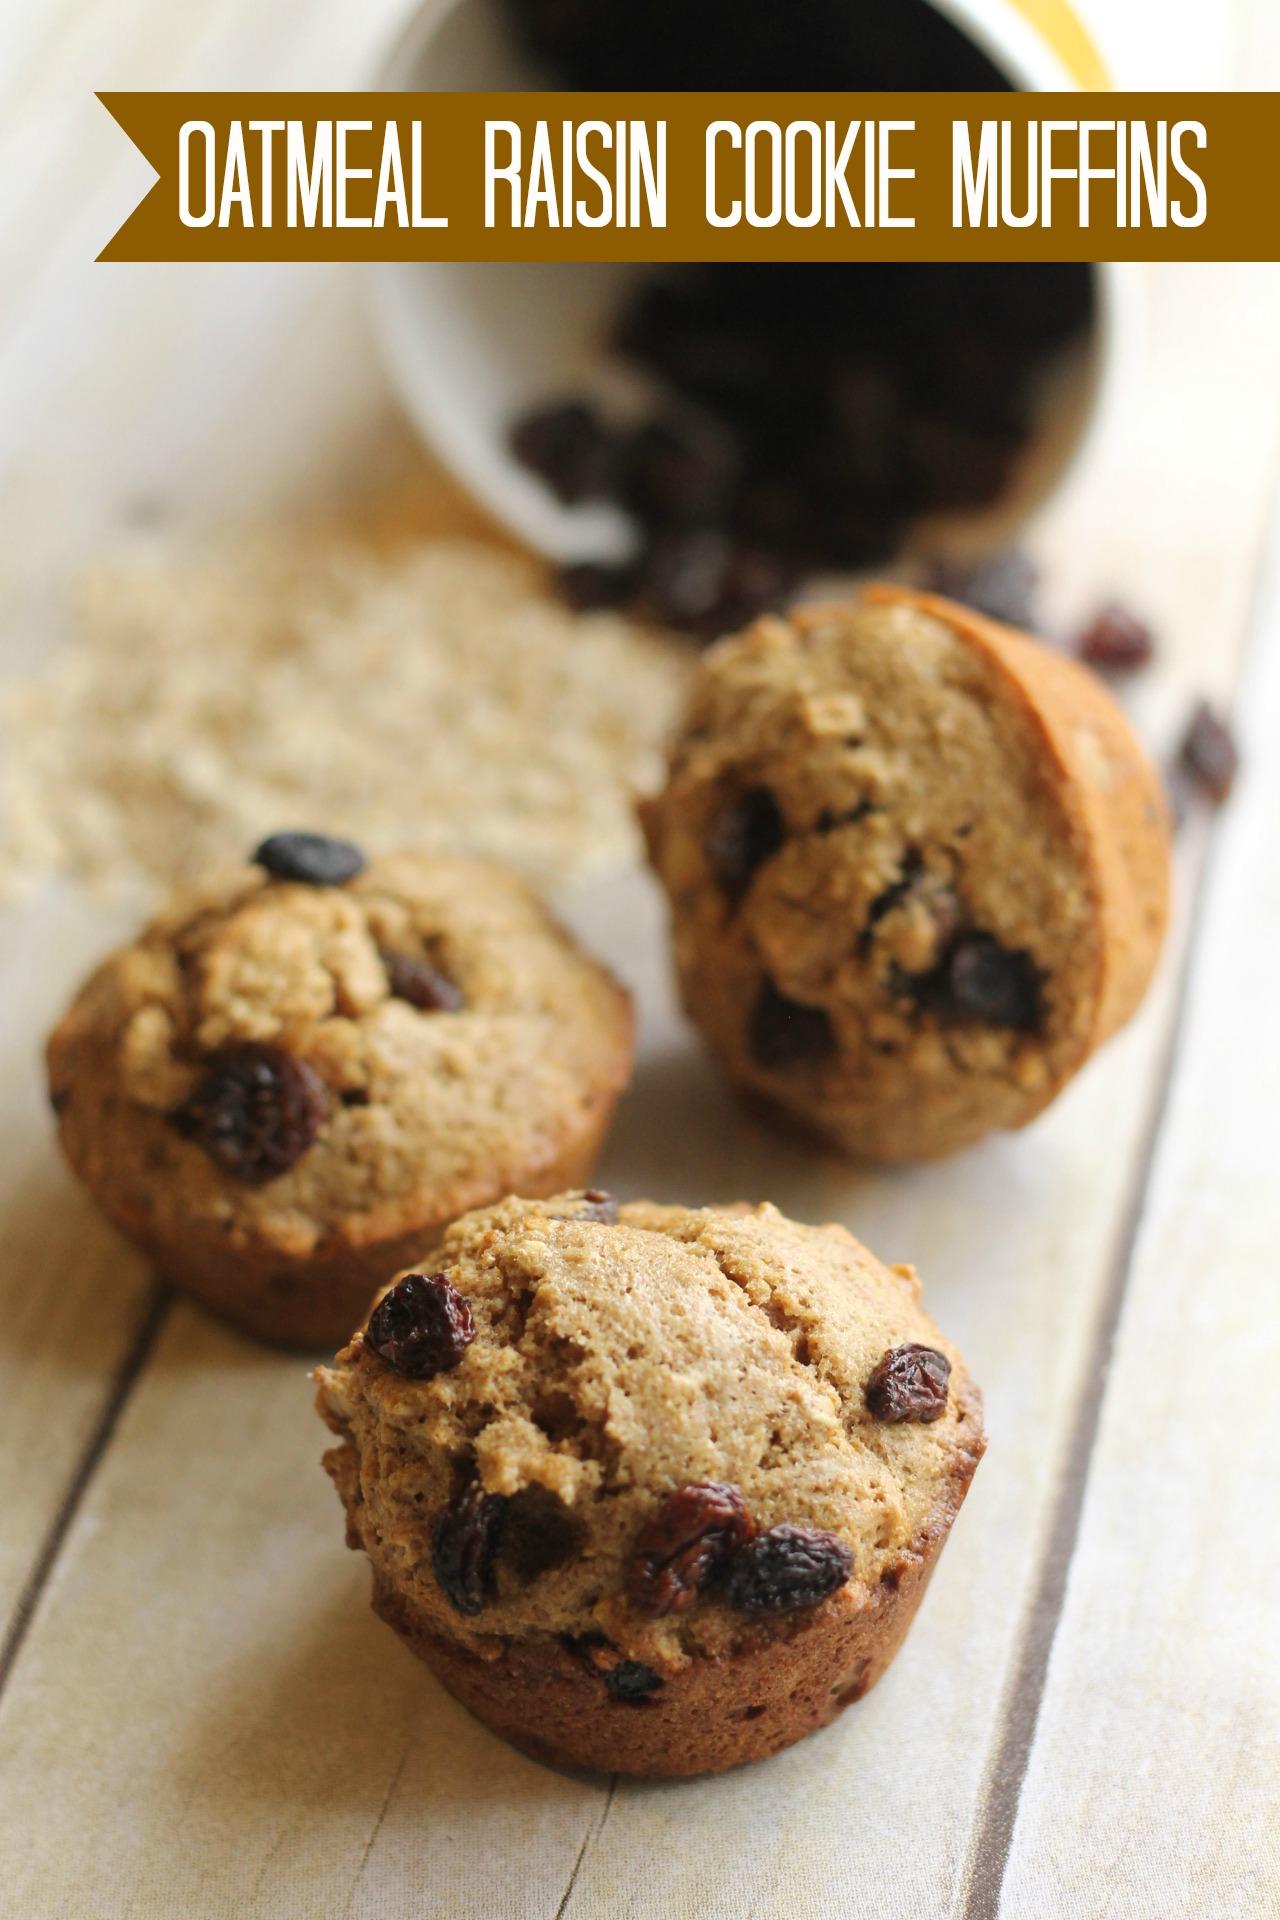 Oatmeal Raisin Cookie Muffins Recipe - {Not Quite} Susie ...